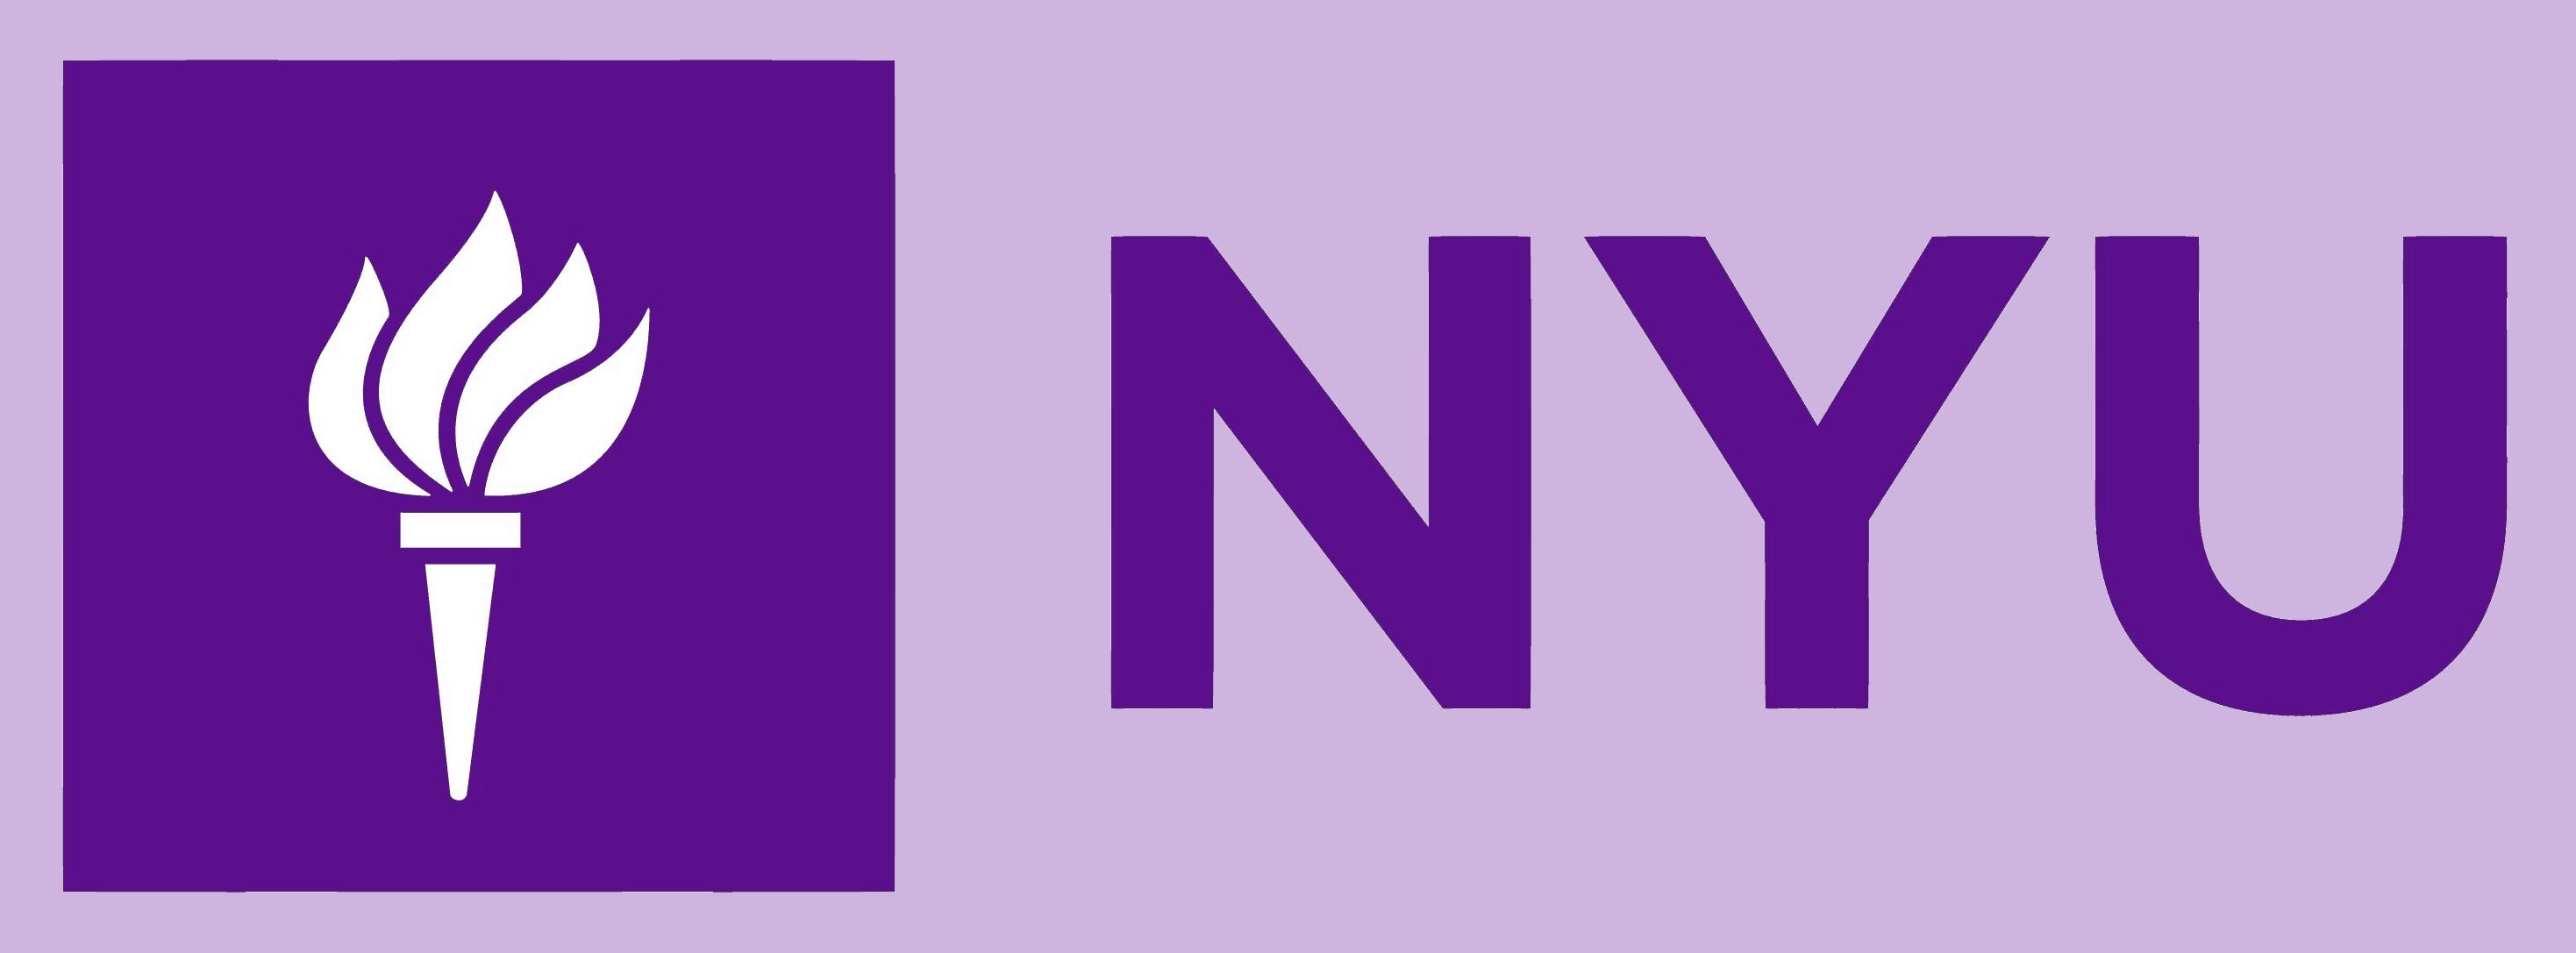 tandon school of engineering new york university logo 130098